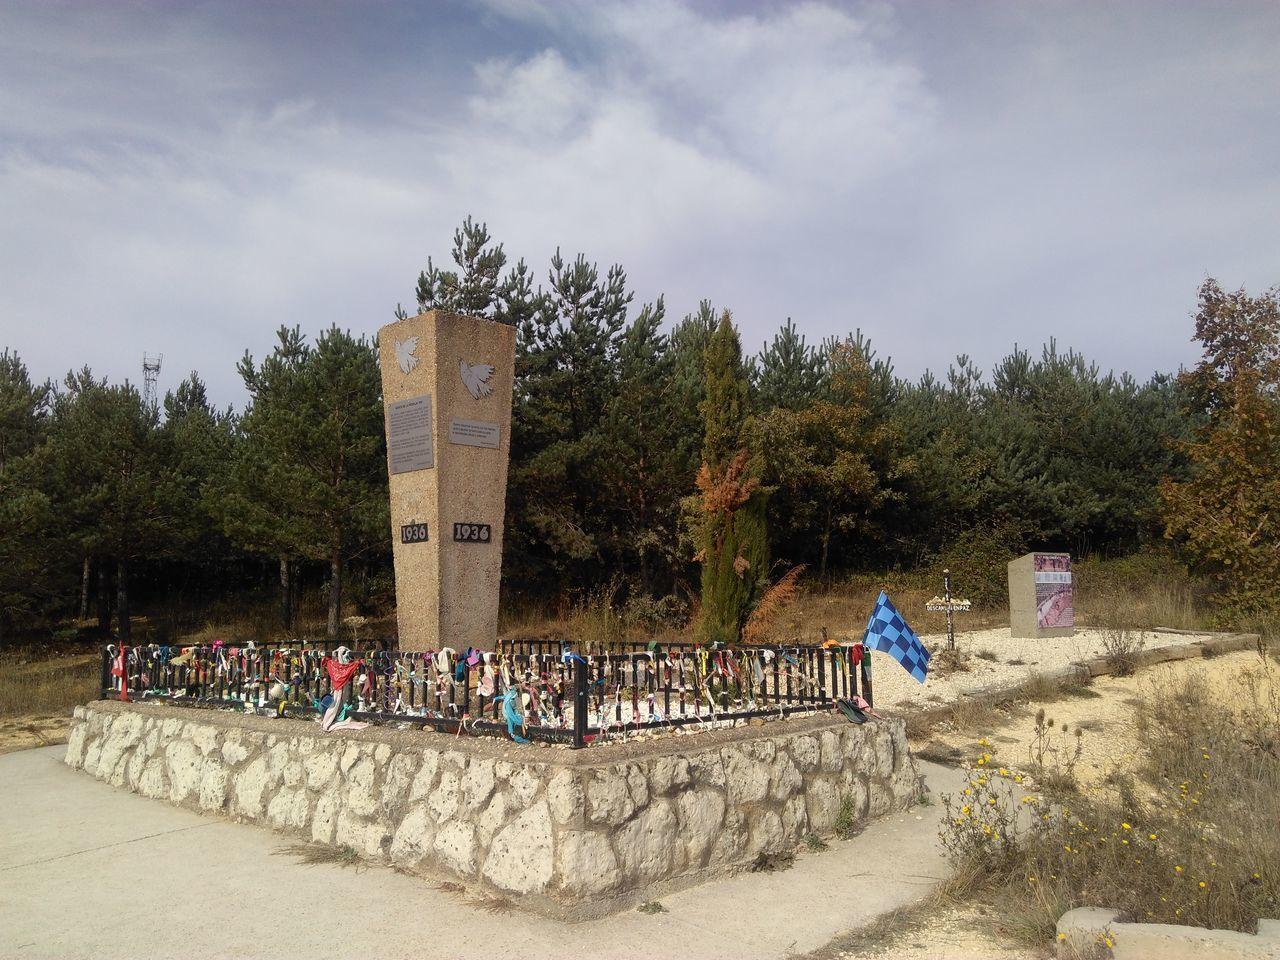 No People Jakobsweg Way Of Saint James Camino CaminodeSantiago Camino De Santiago Track Way Road Travel Reise Monument Denkmal 1936